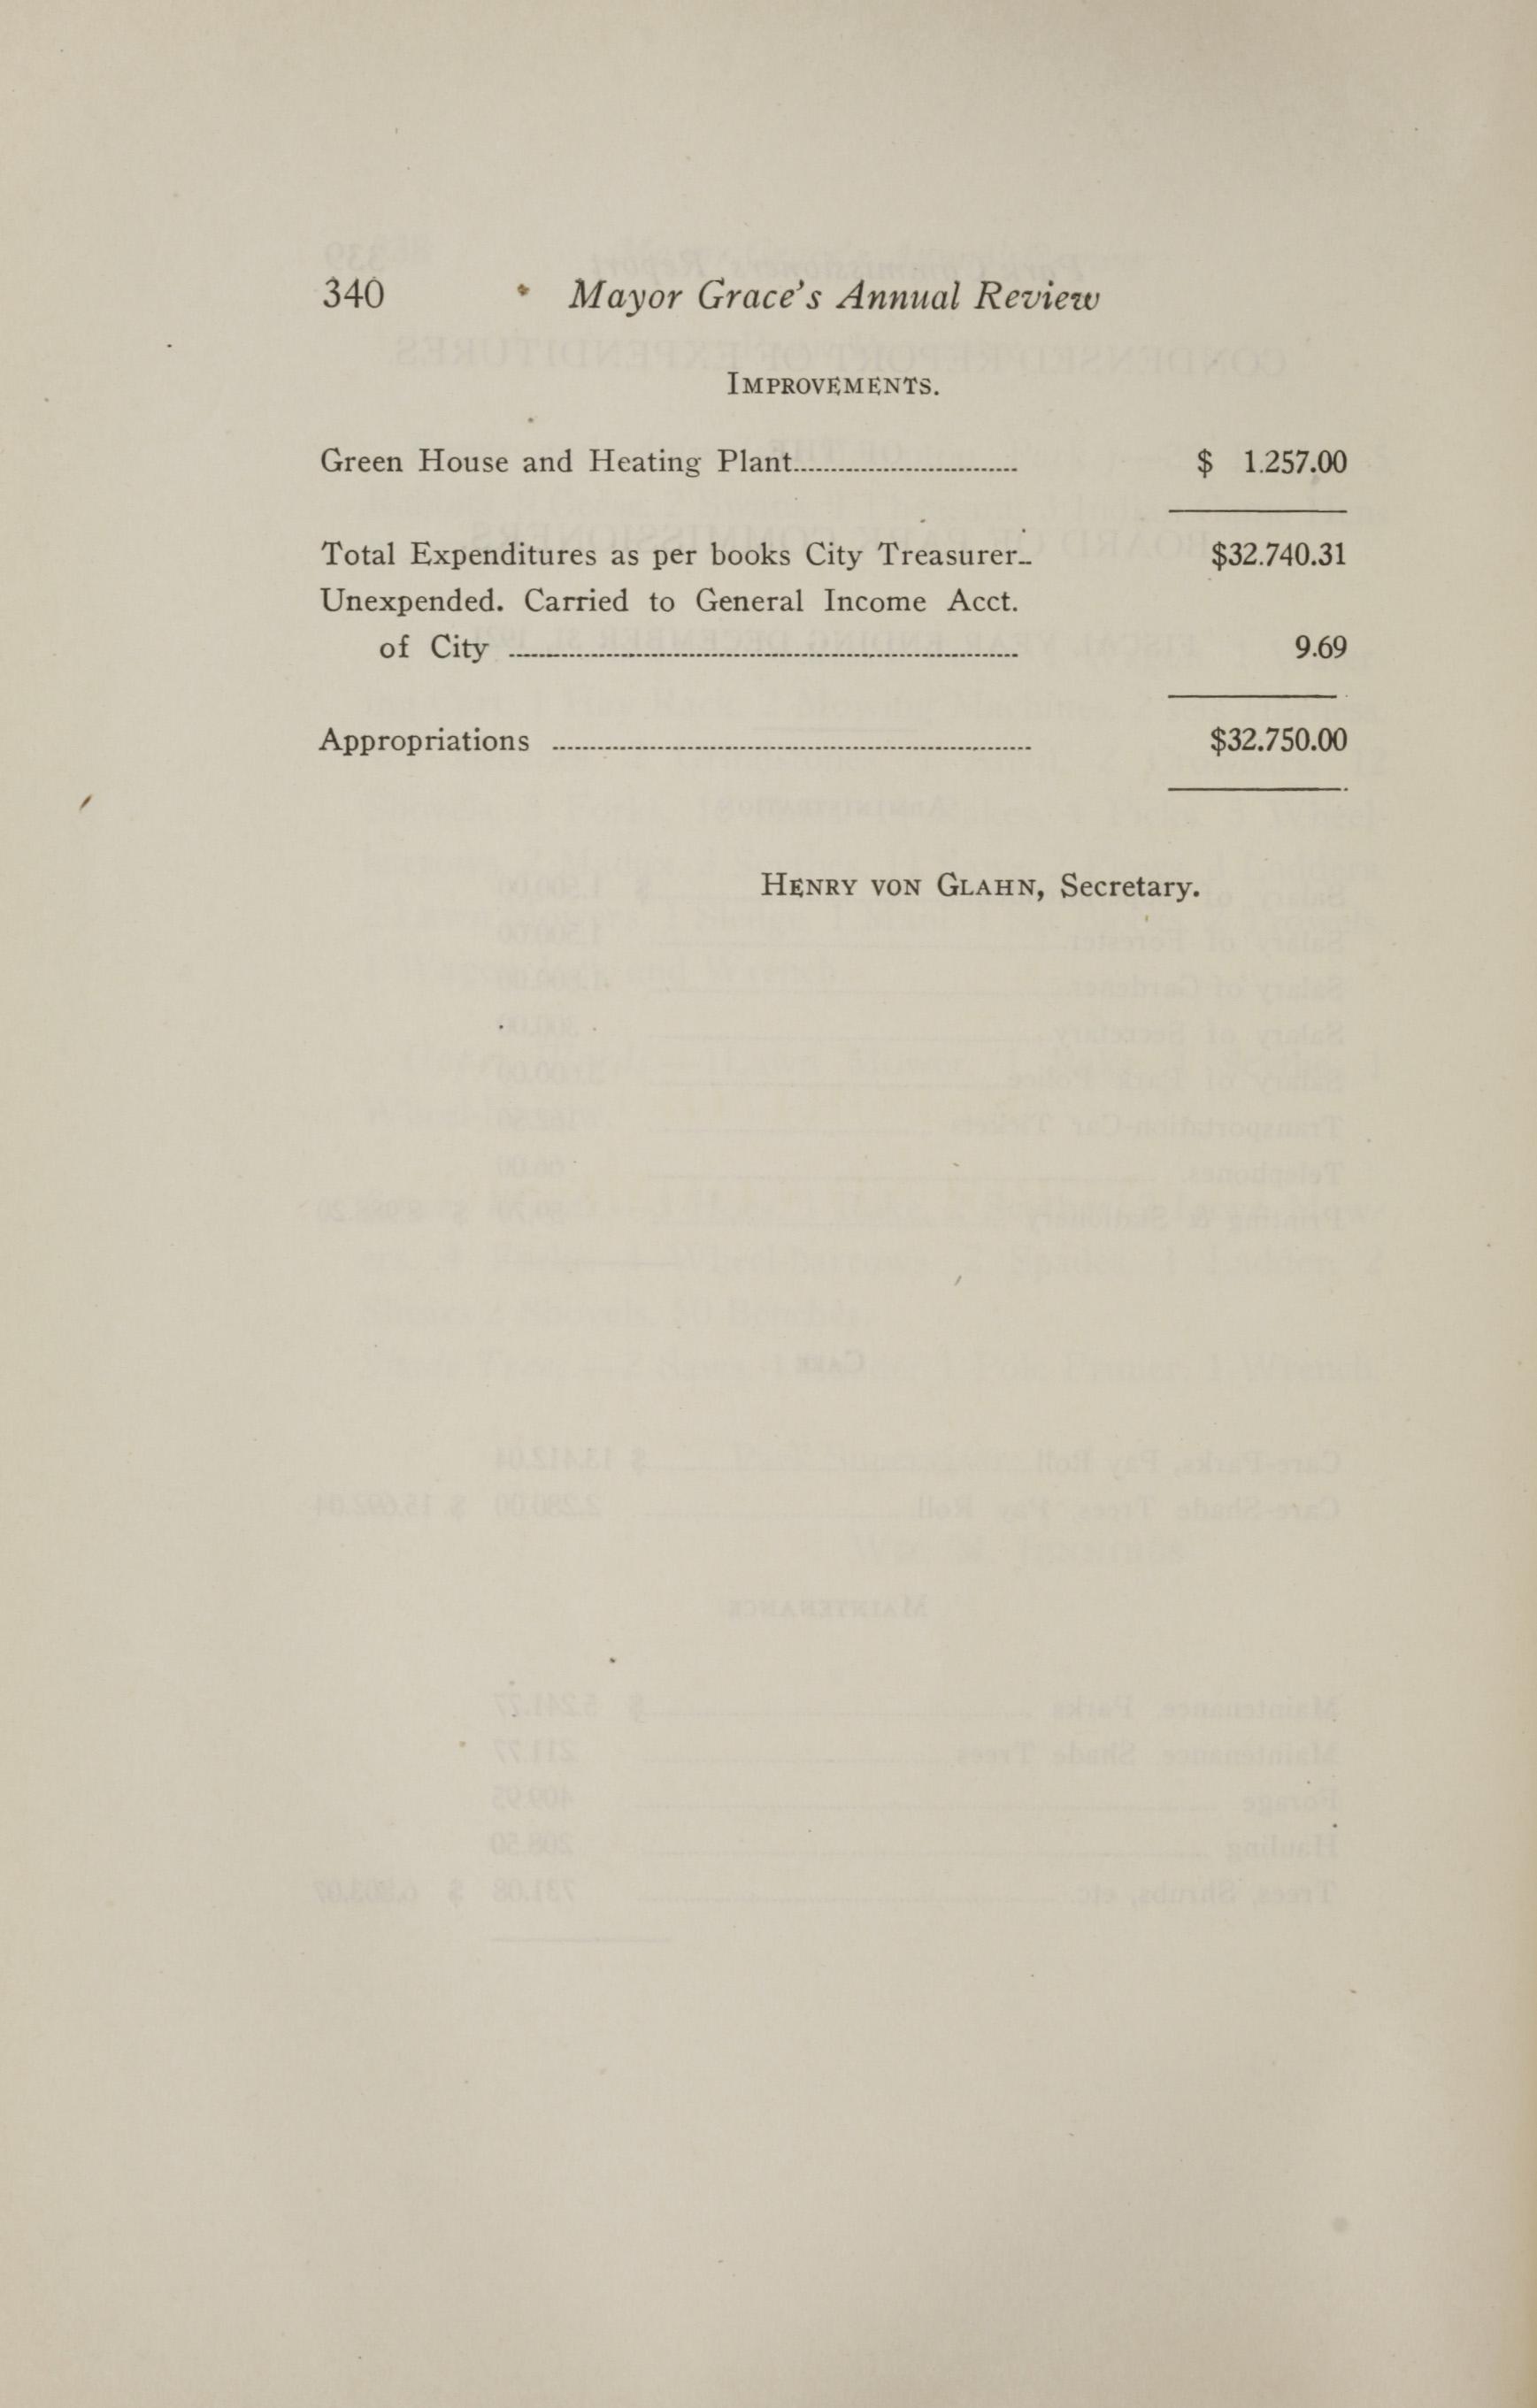 Charleston Yearbook, 1921, page 340